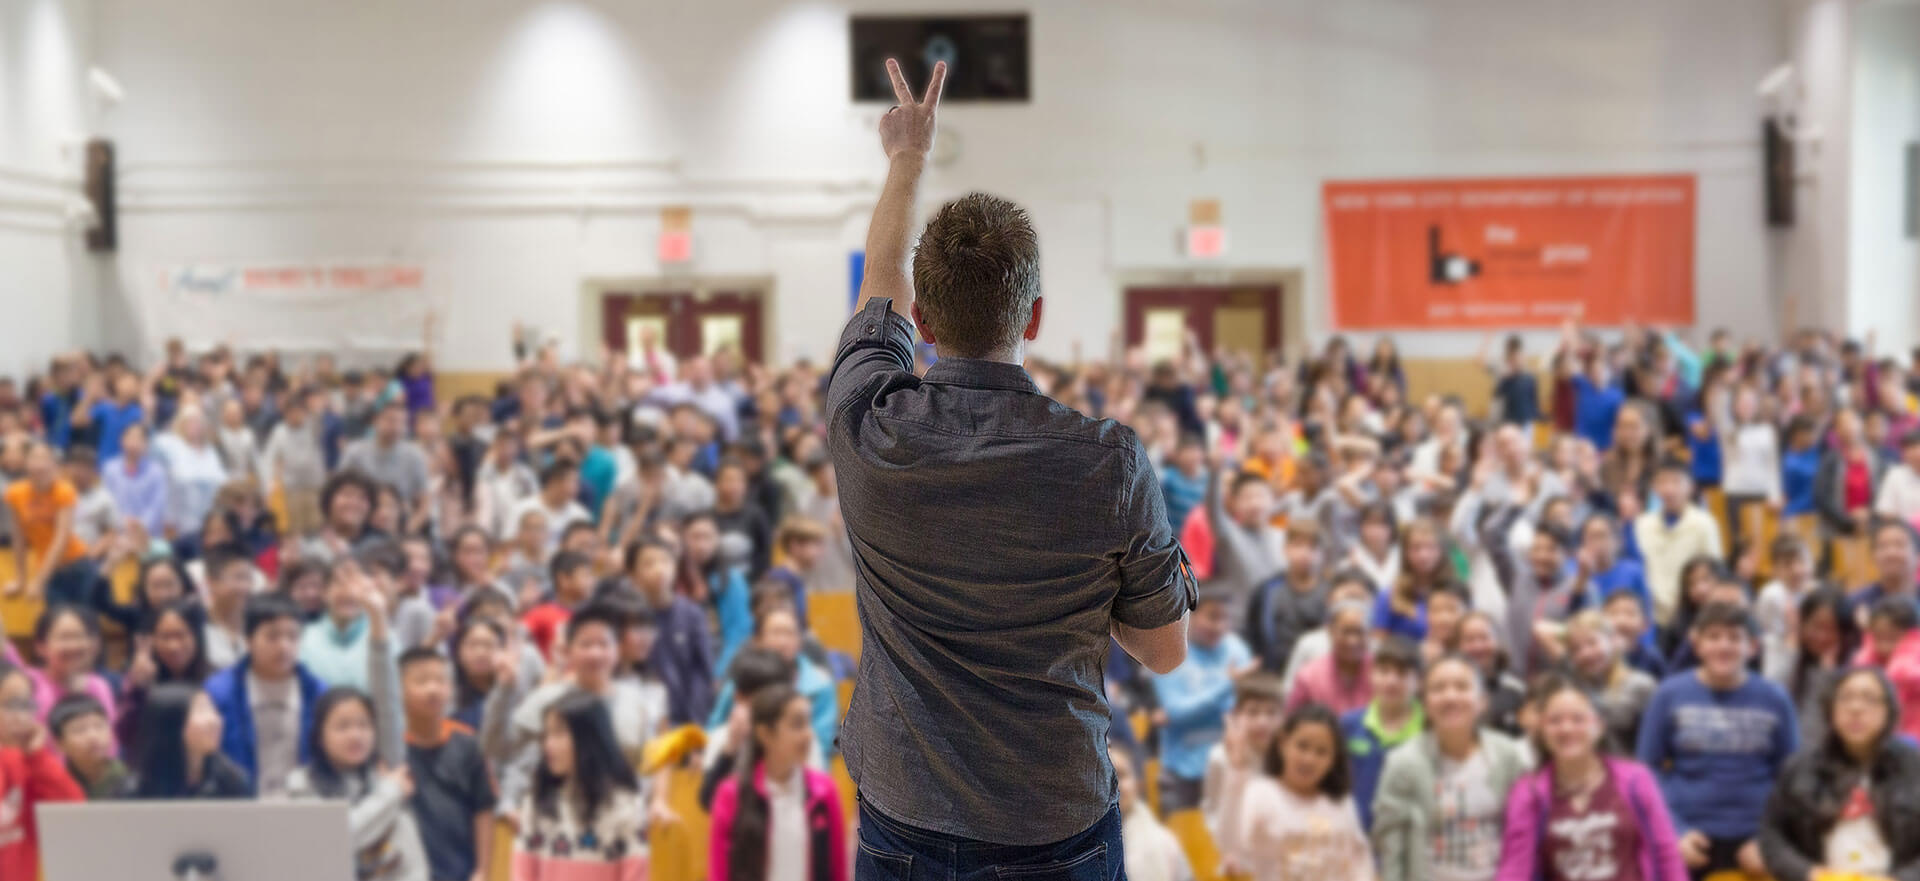 Image of America's top anti-bullying speaker Tom Thelen